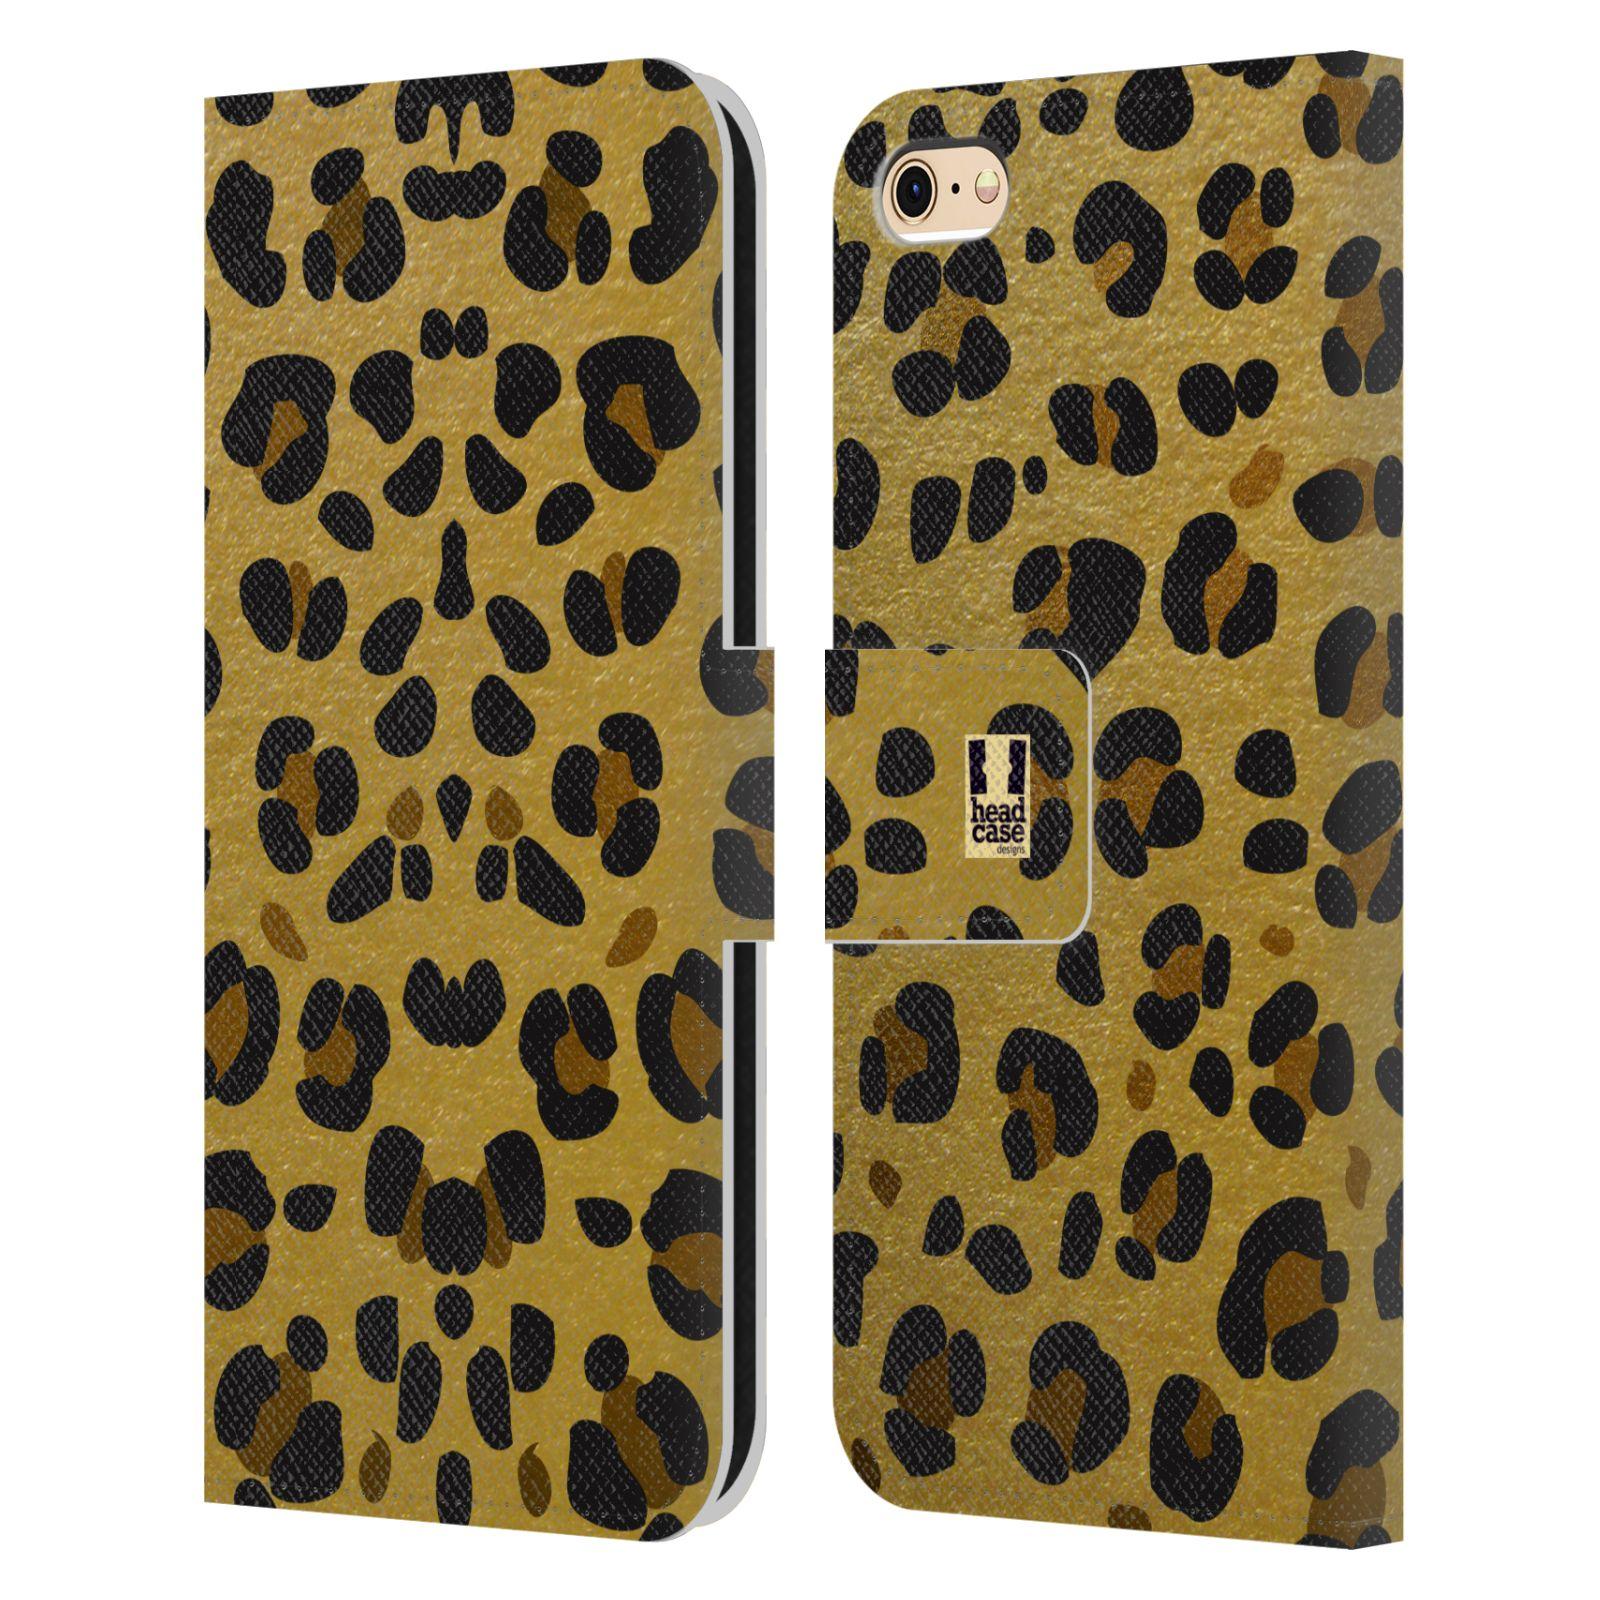 Pouzdro na mobil Apple Iphone 6 / 6S - Head Case - Fashion zvířecí vzor